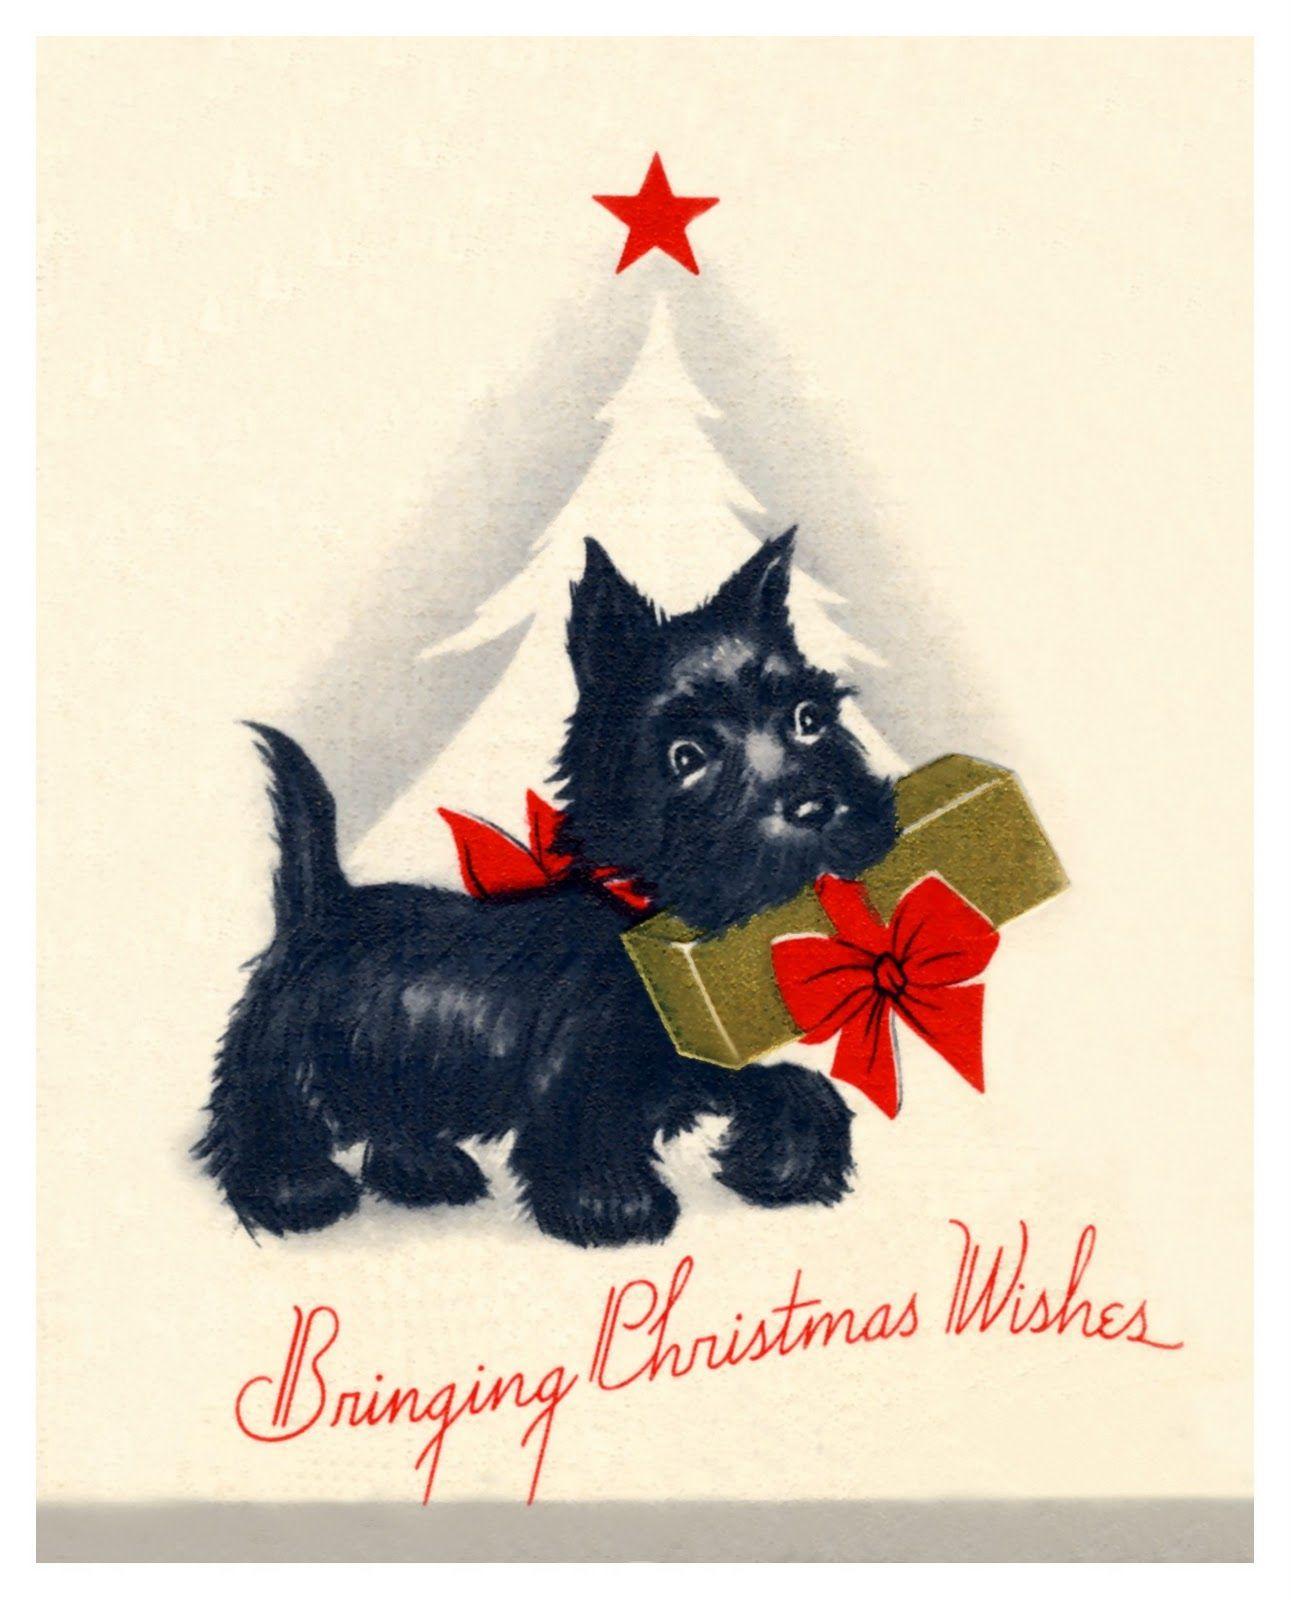 scottish christmas card vintage | Vintage Scottie Christmas Card | Scottish Terriers